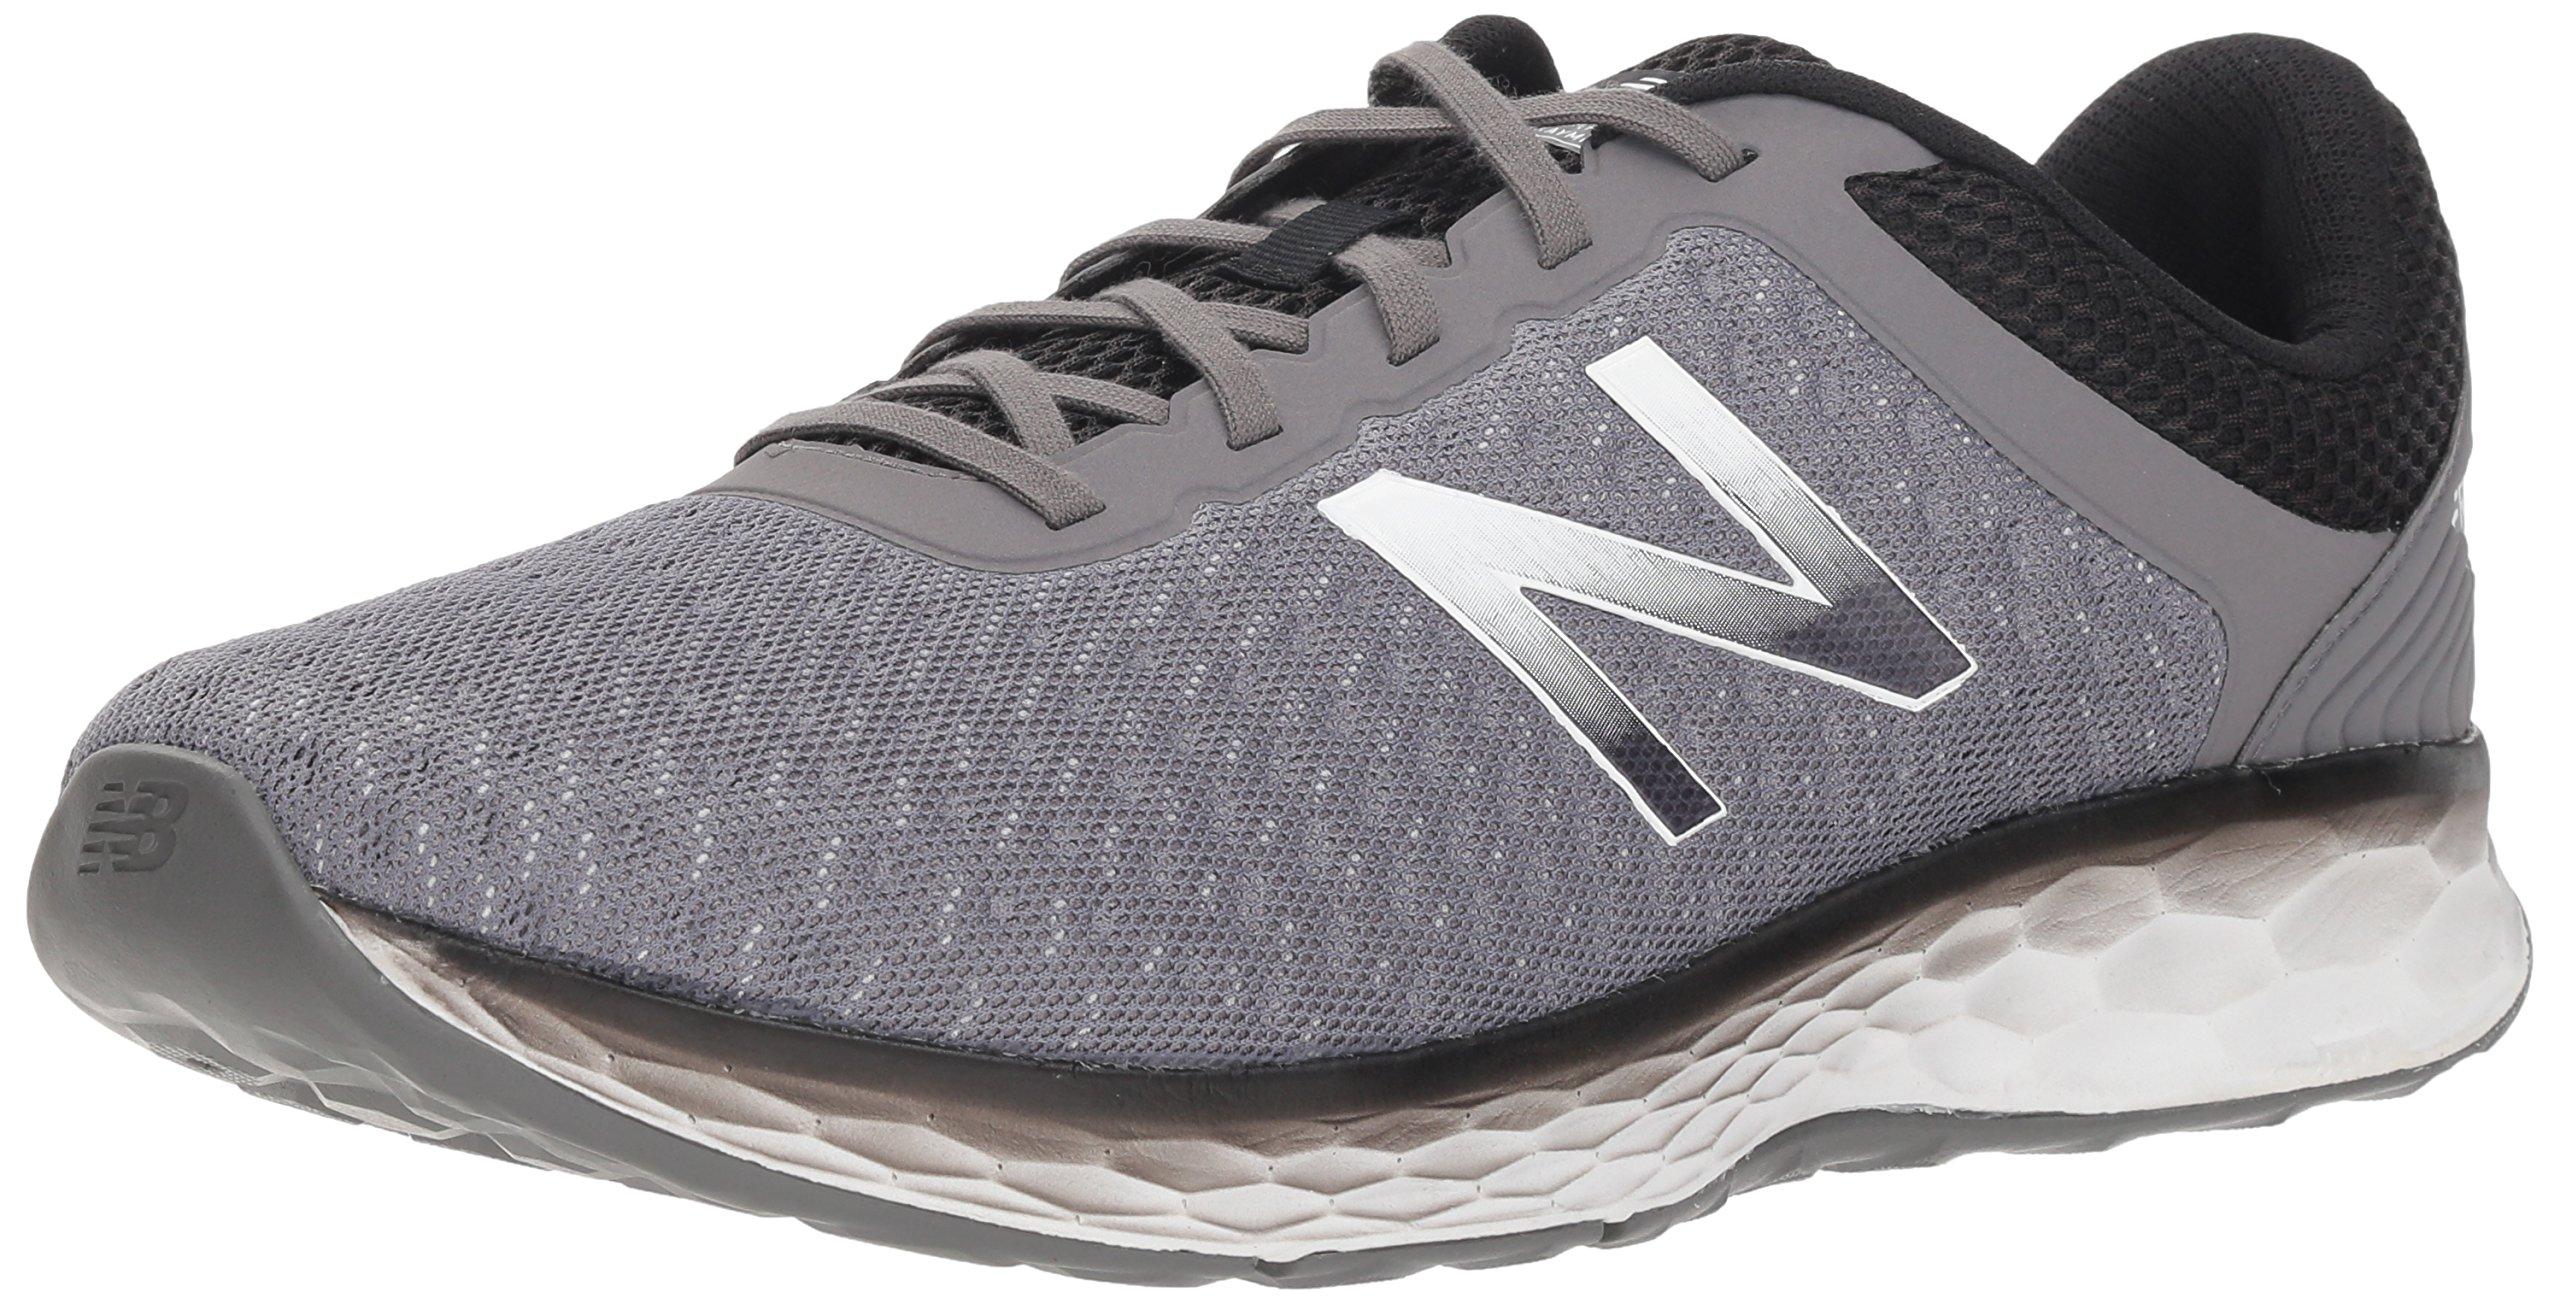 New Balance Men's Kaymin V1 Fresh Foam Running Shoe, Grey/Black, 7 D US